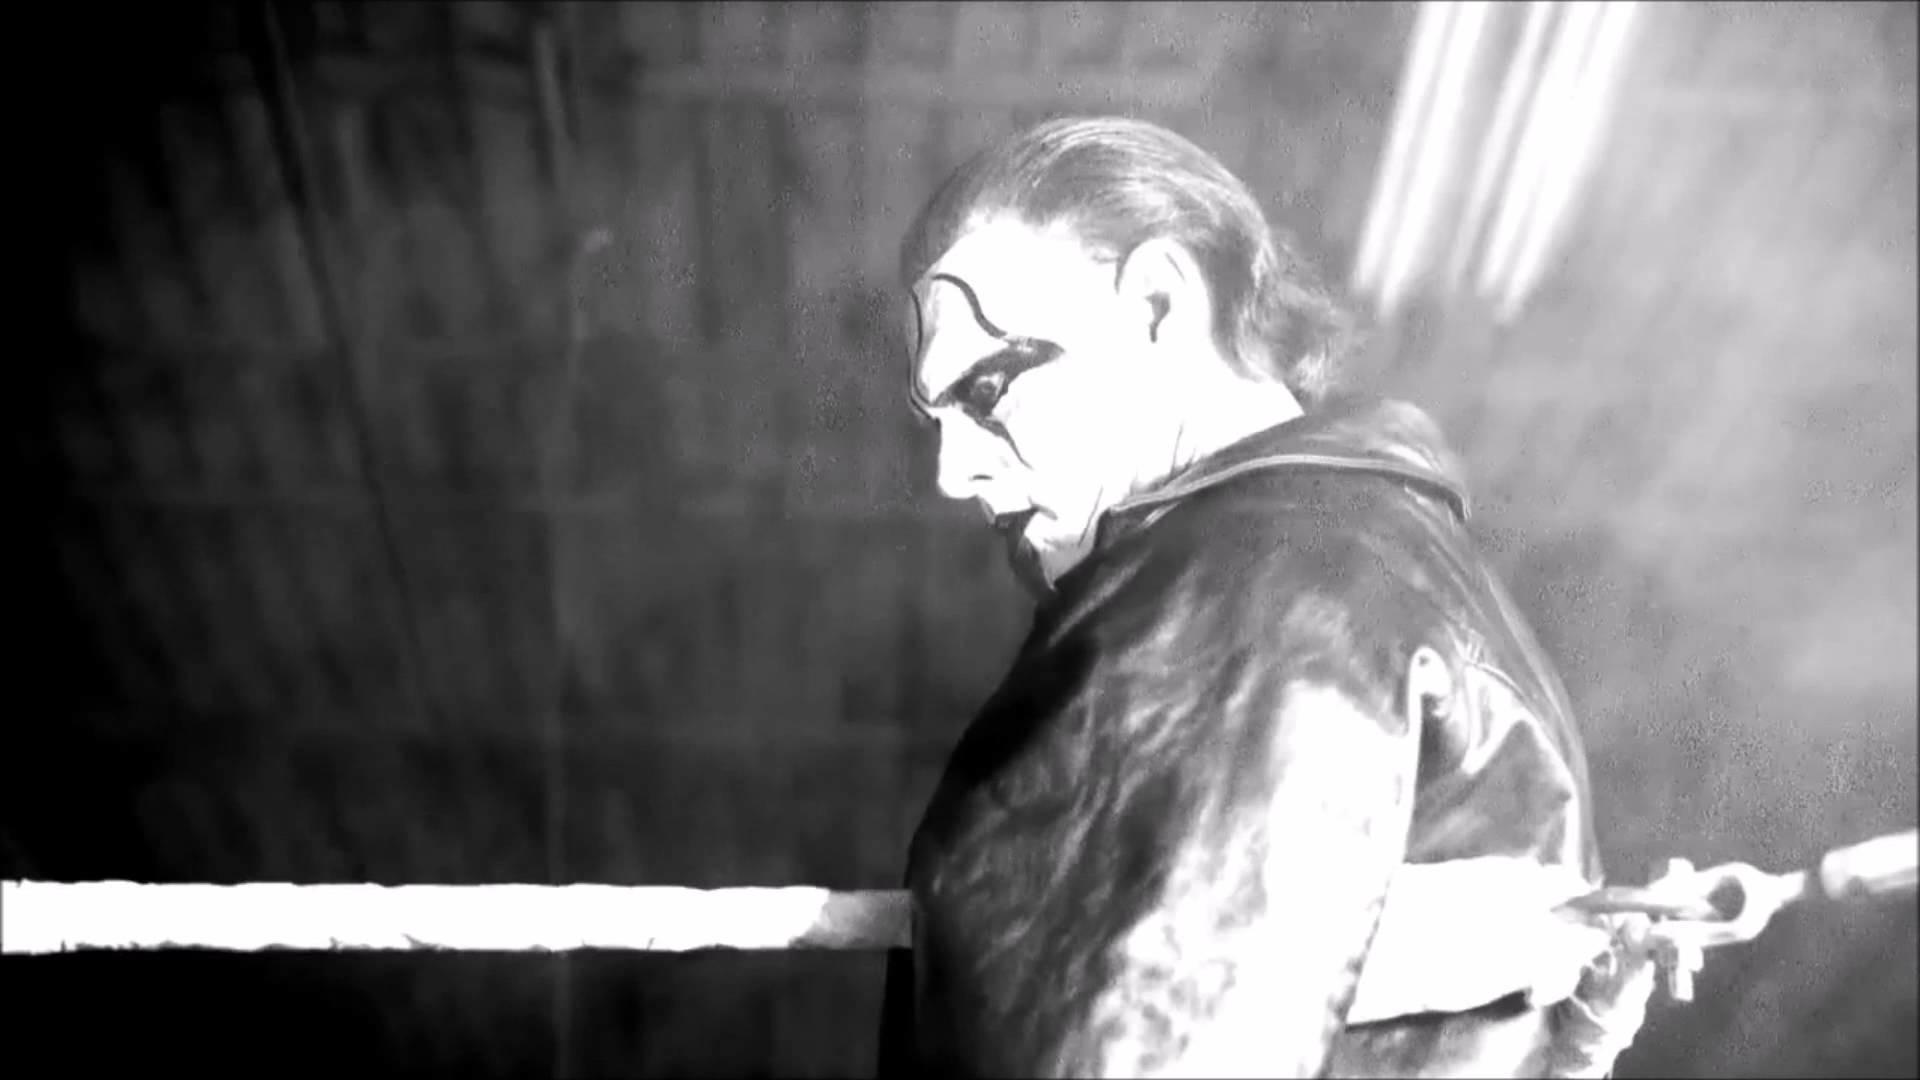 WWE STING 2014 TITANTRON 1080p HD